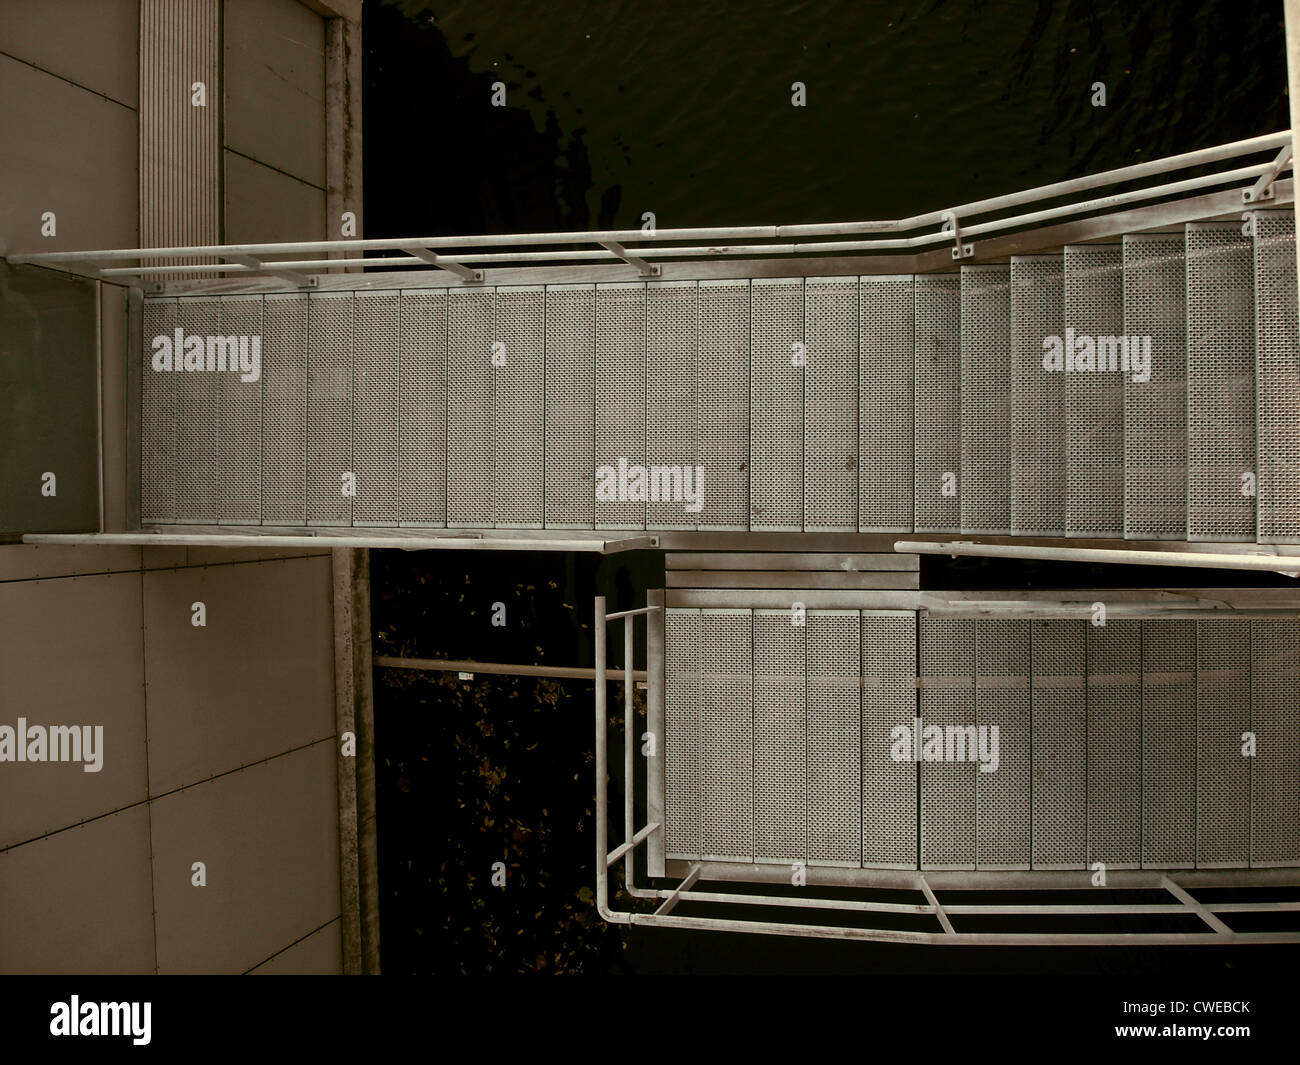 Scala,steps,acciaio inossidabile Foto Stock